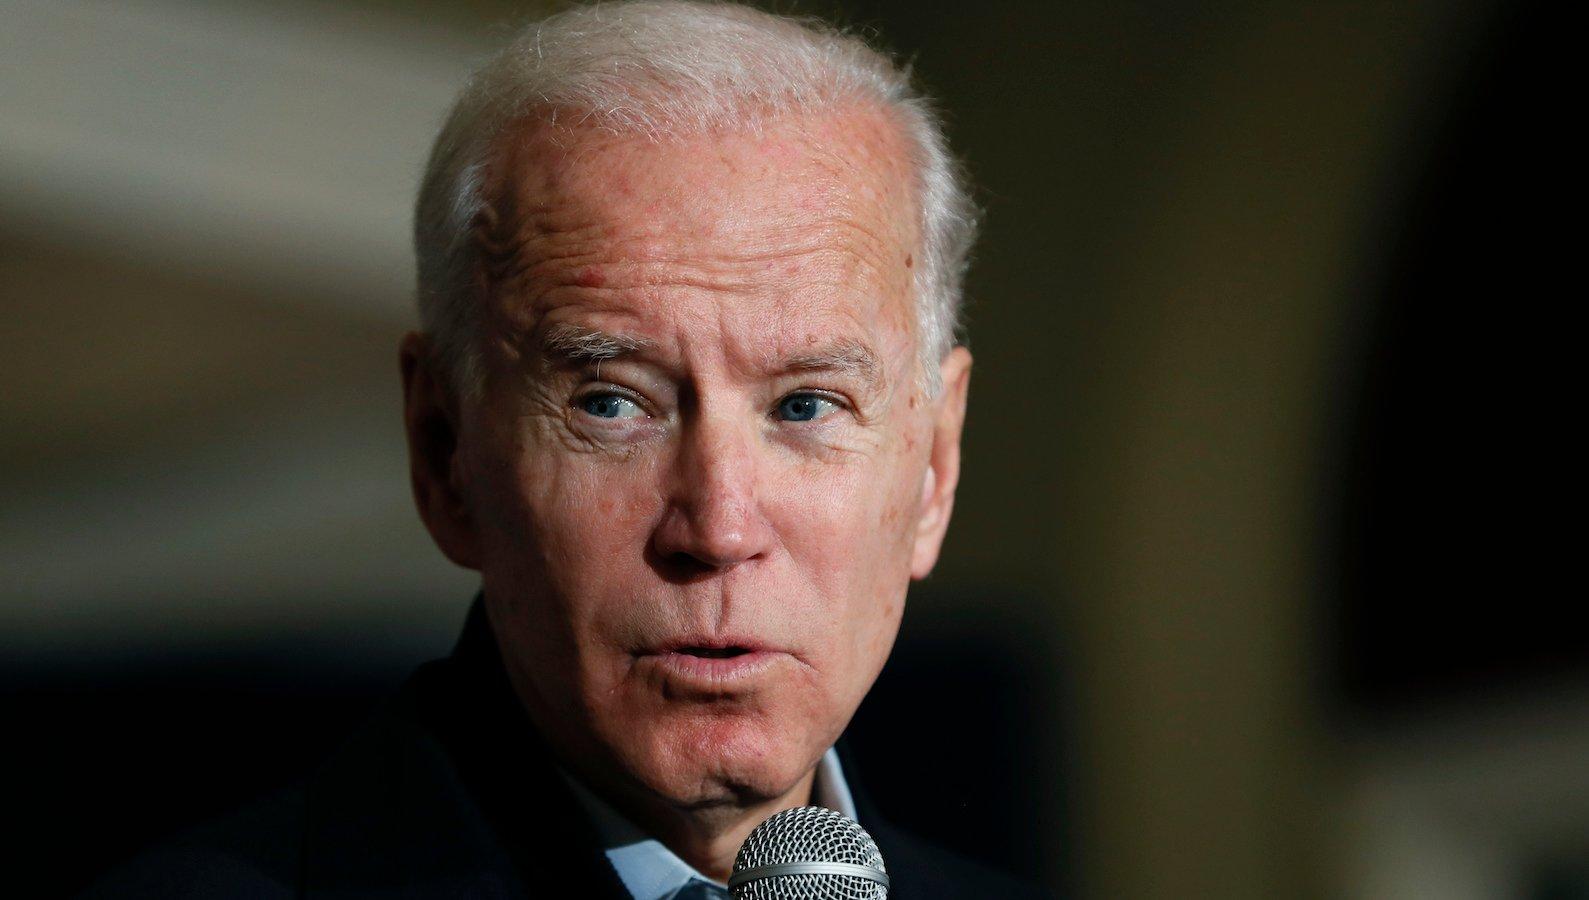 Joe Biden on restoring the soul of our nation - Religion News Service